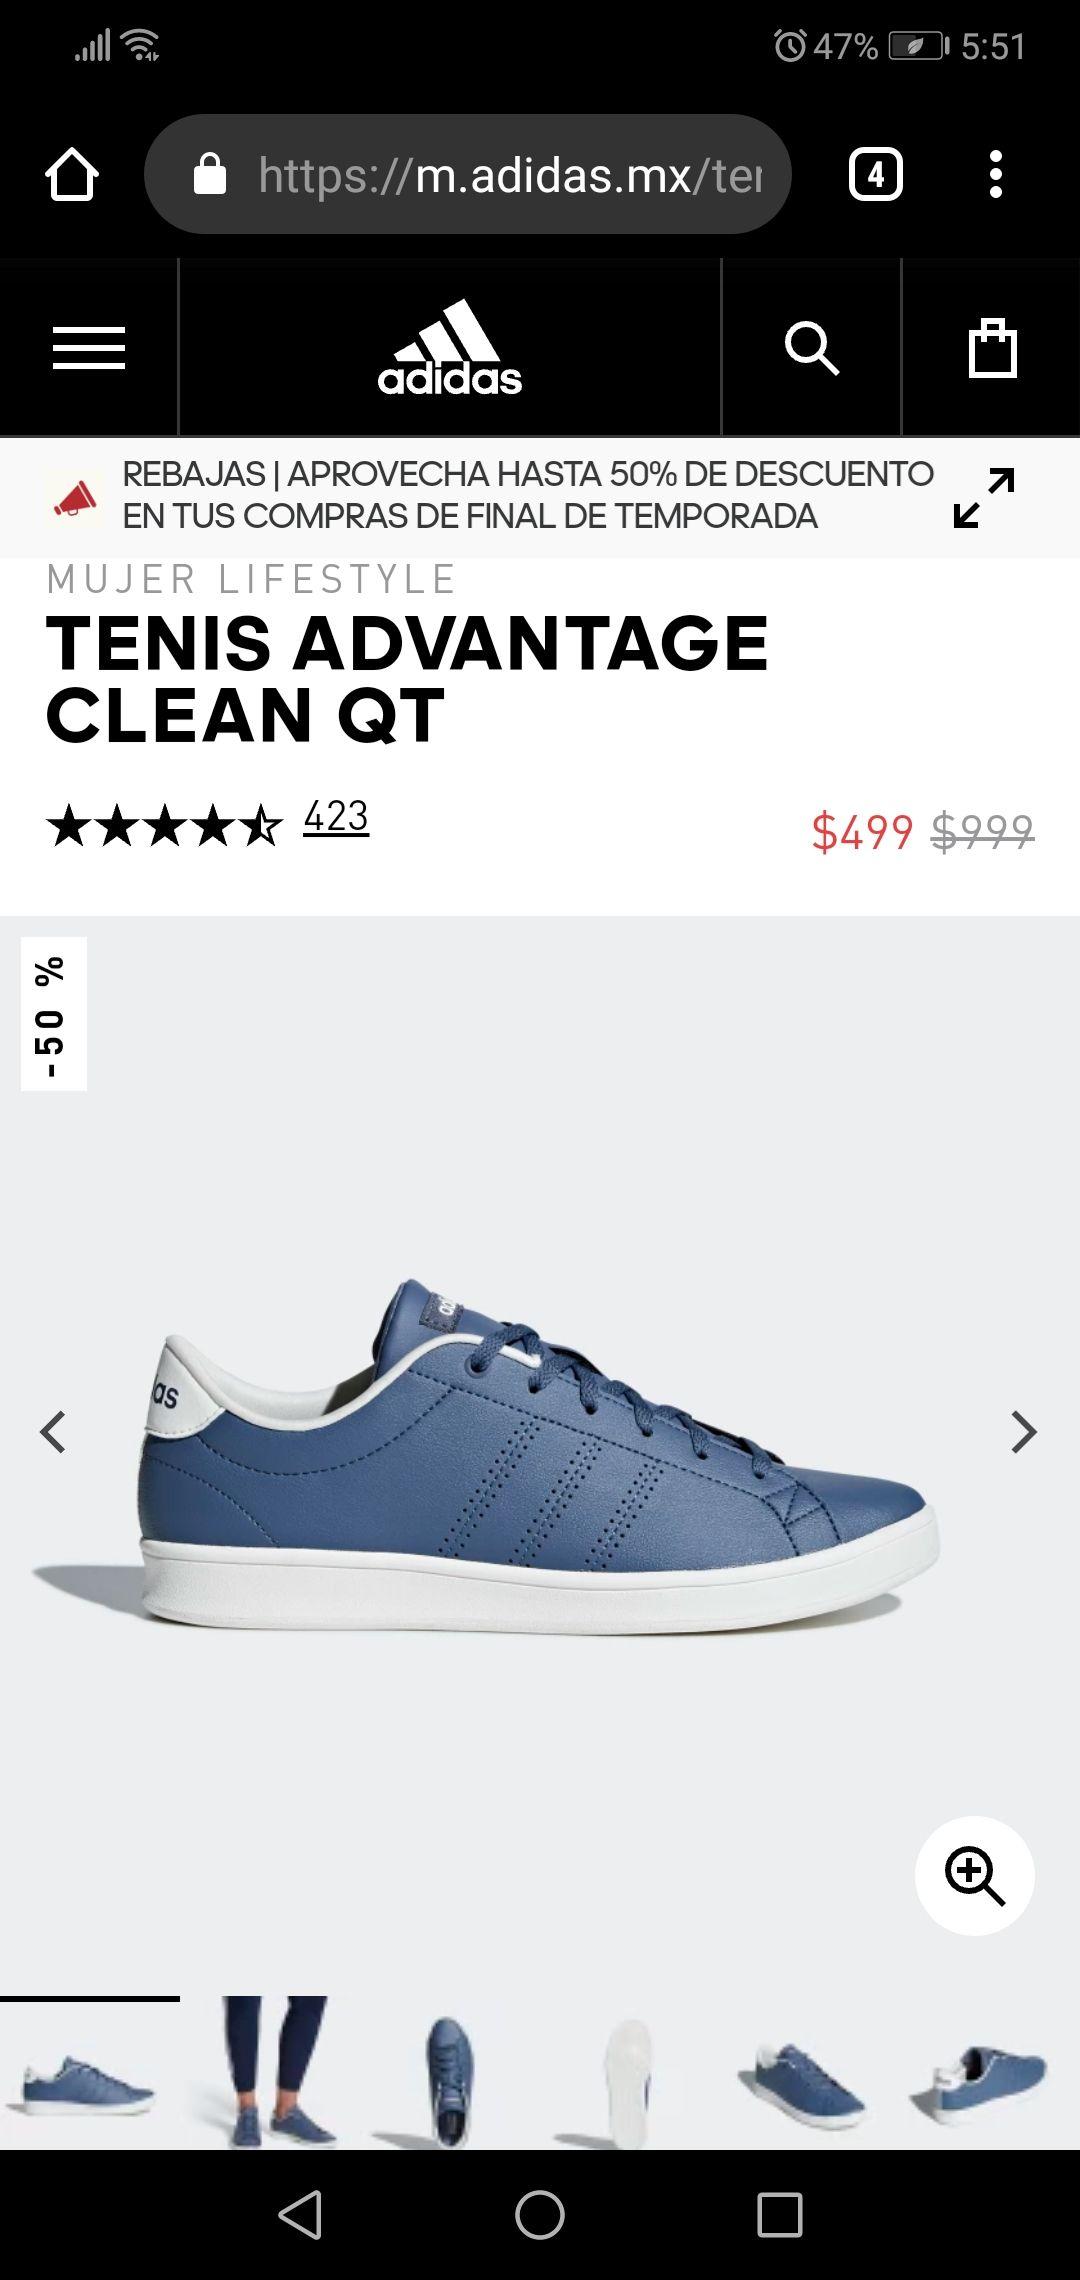 Adidas: TENIS ADVANTAGE CLEAN QT